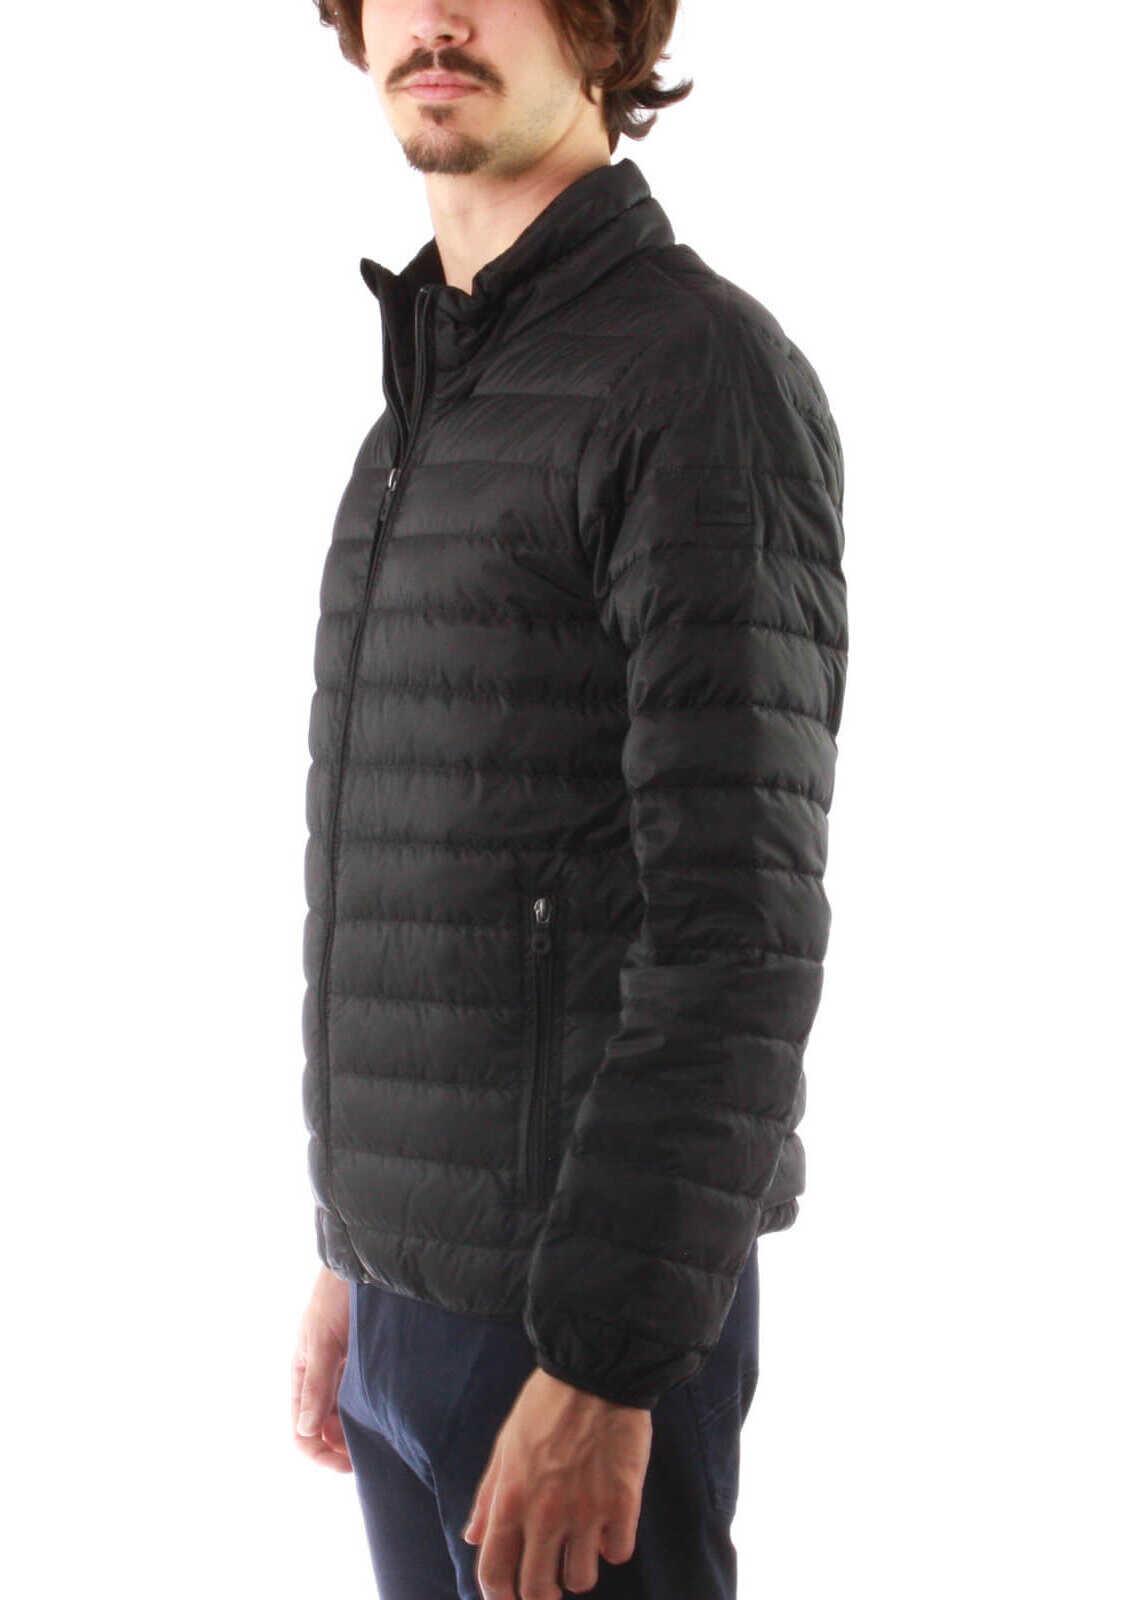 Armani Jeans 8N6B72 6NHPZ 1200 jacket black* Black